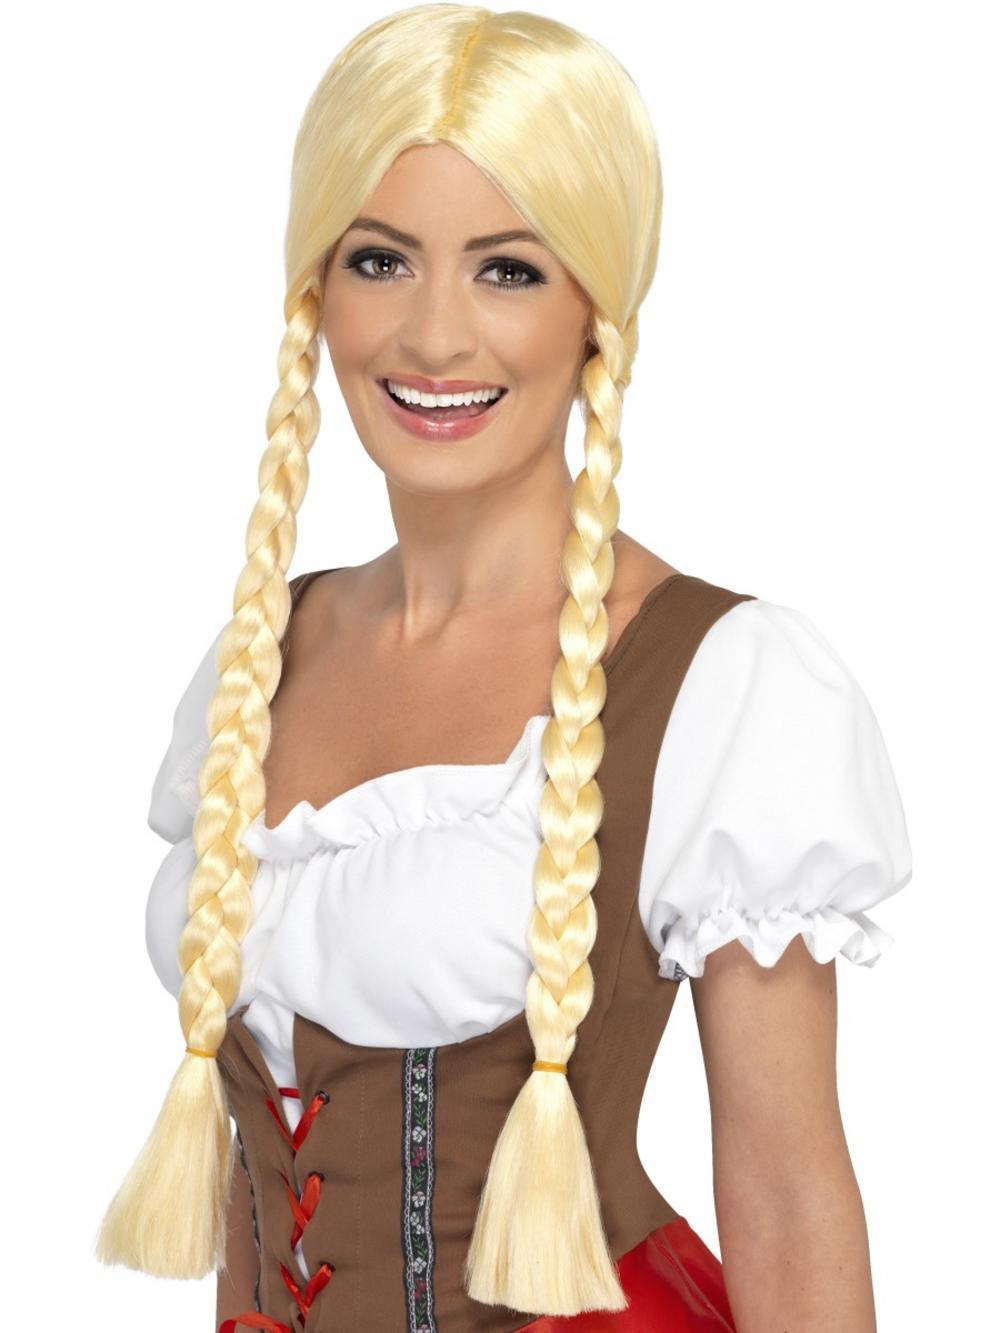 Bavarian bveauty Wig